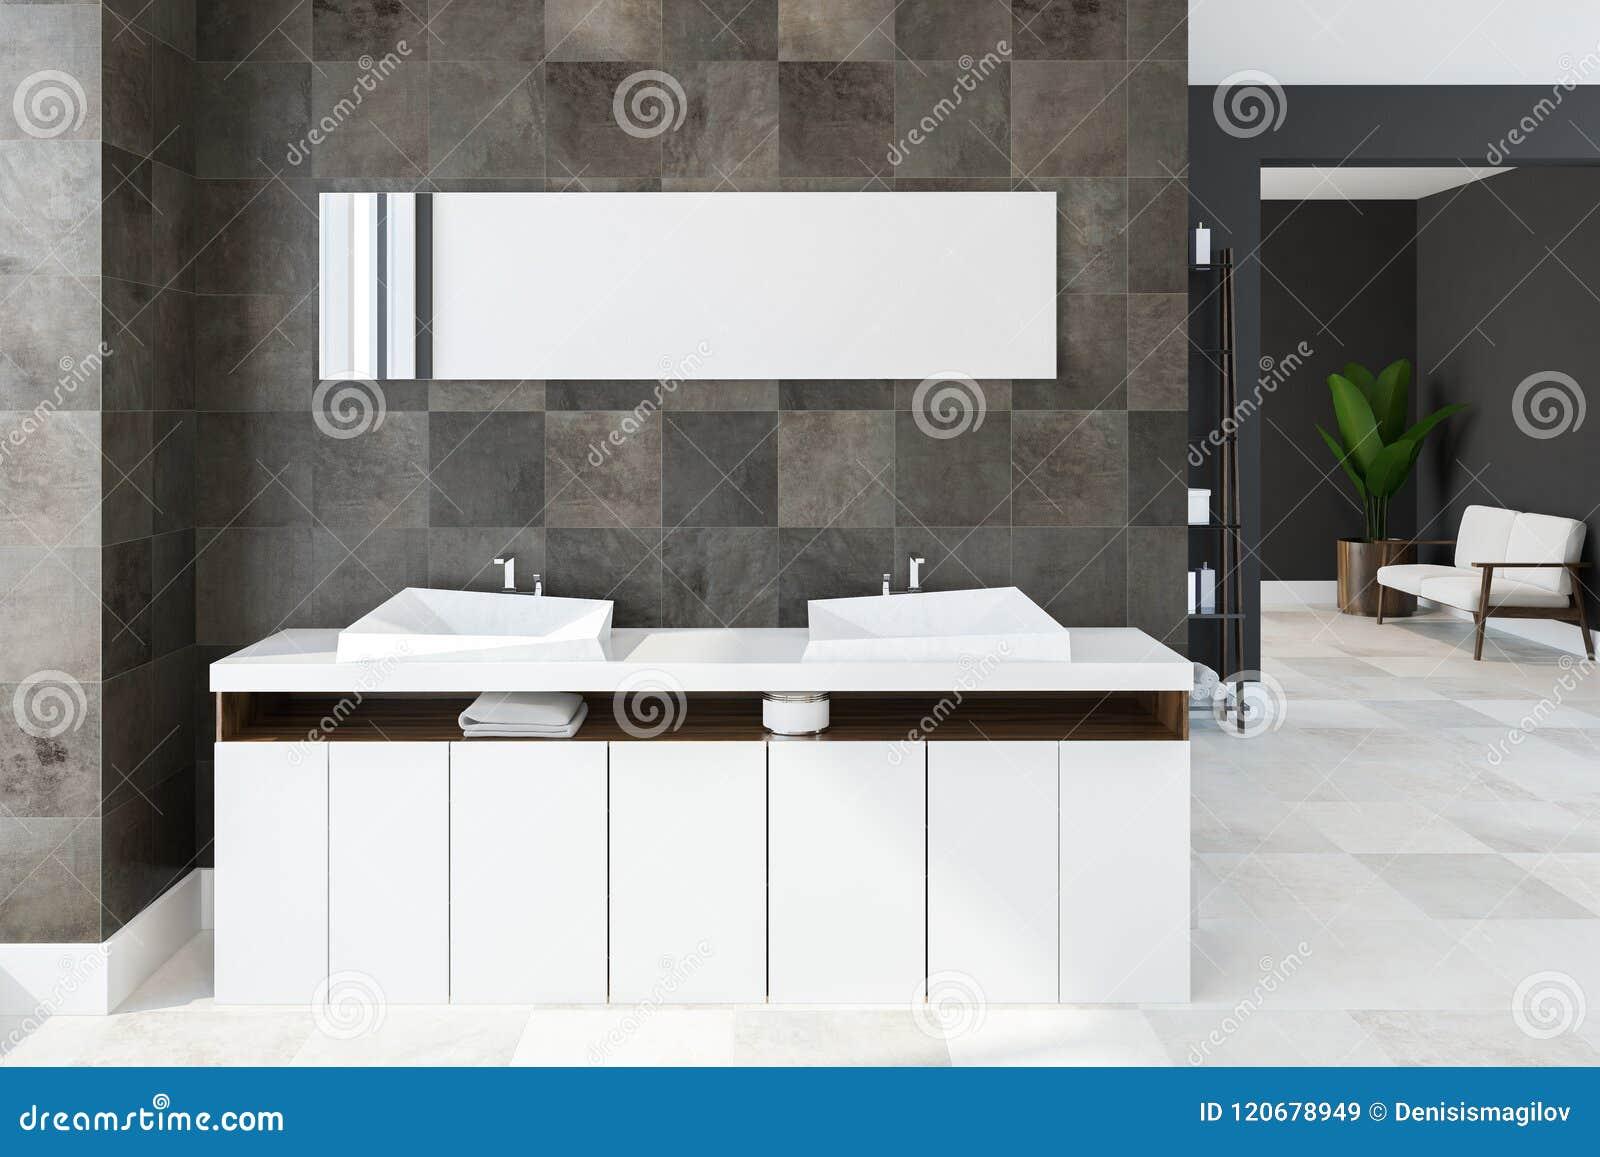 White Twin Sink Vanity Unit, Tiled Bathroom Stock Illustration ...